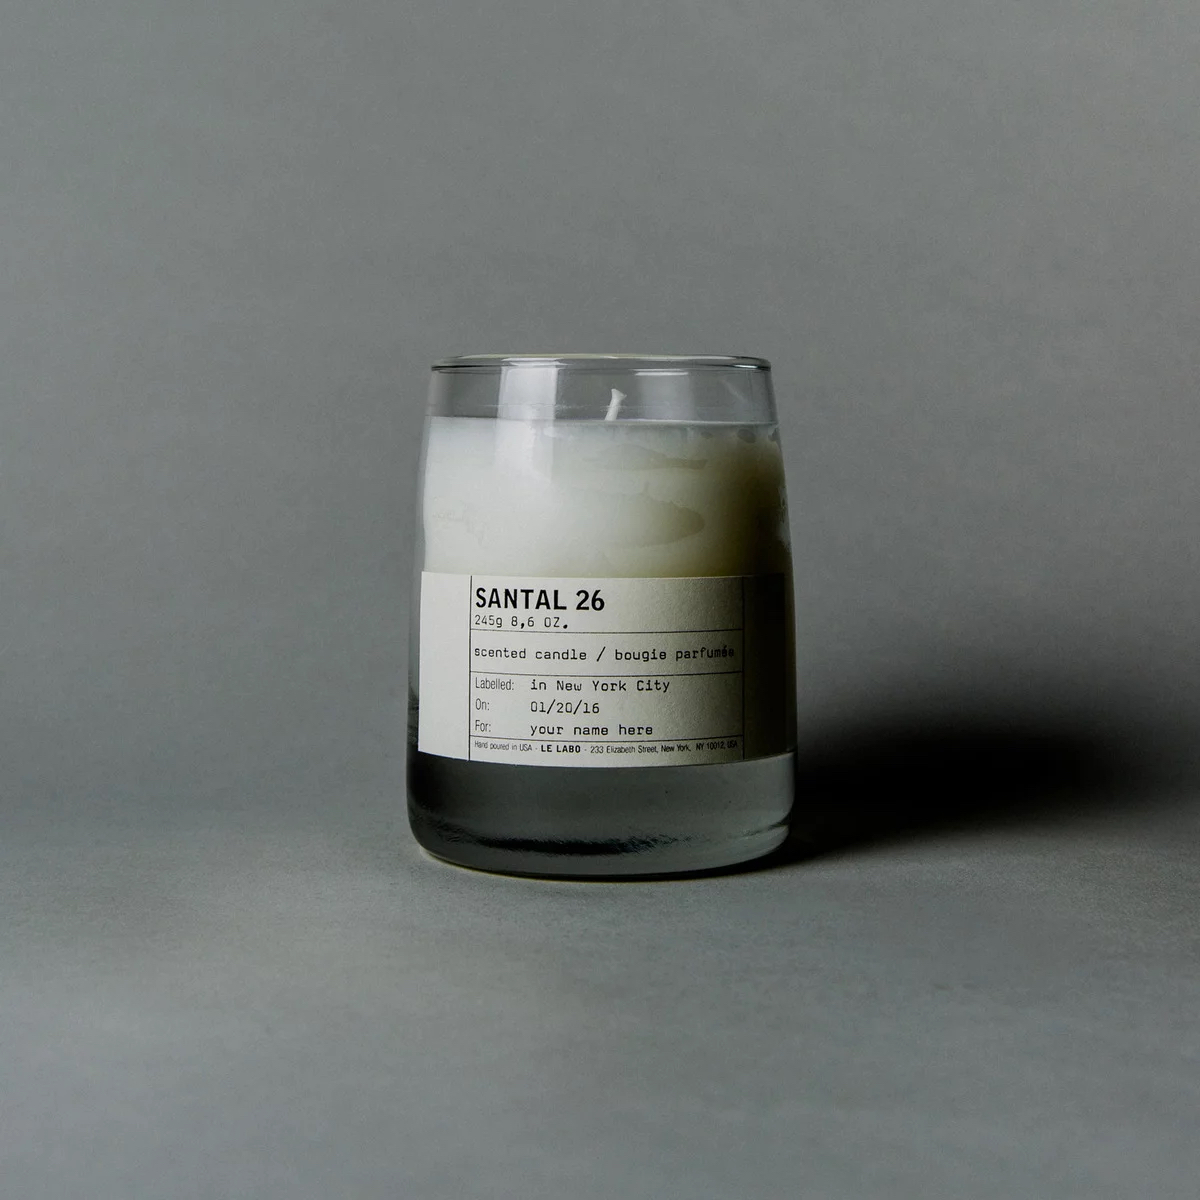 Santal 26 Candle